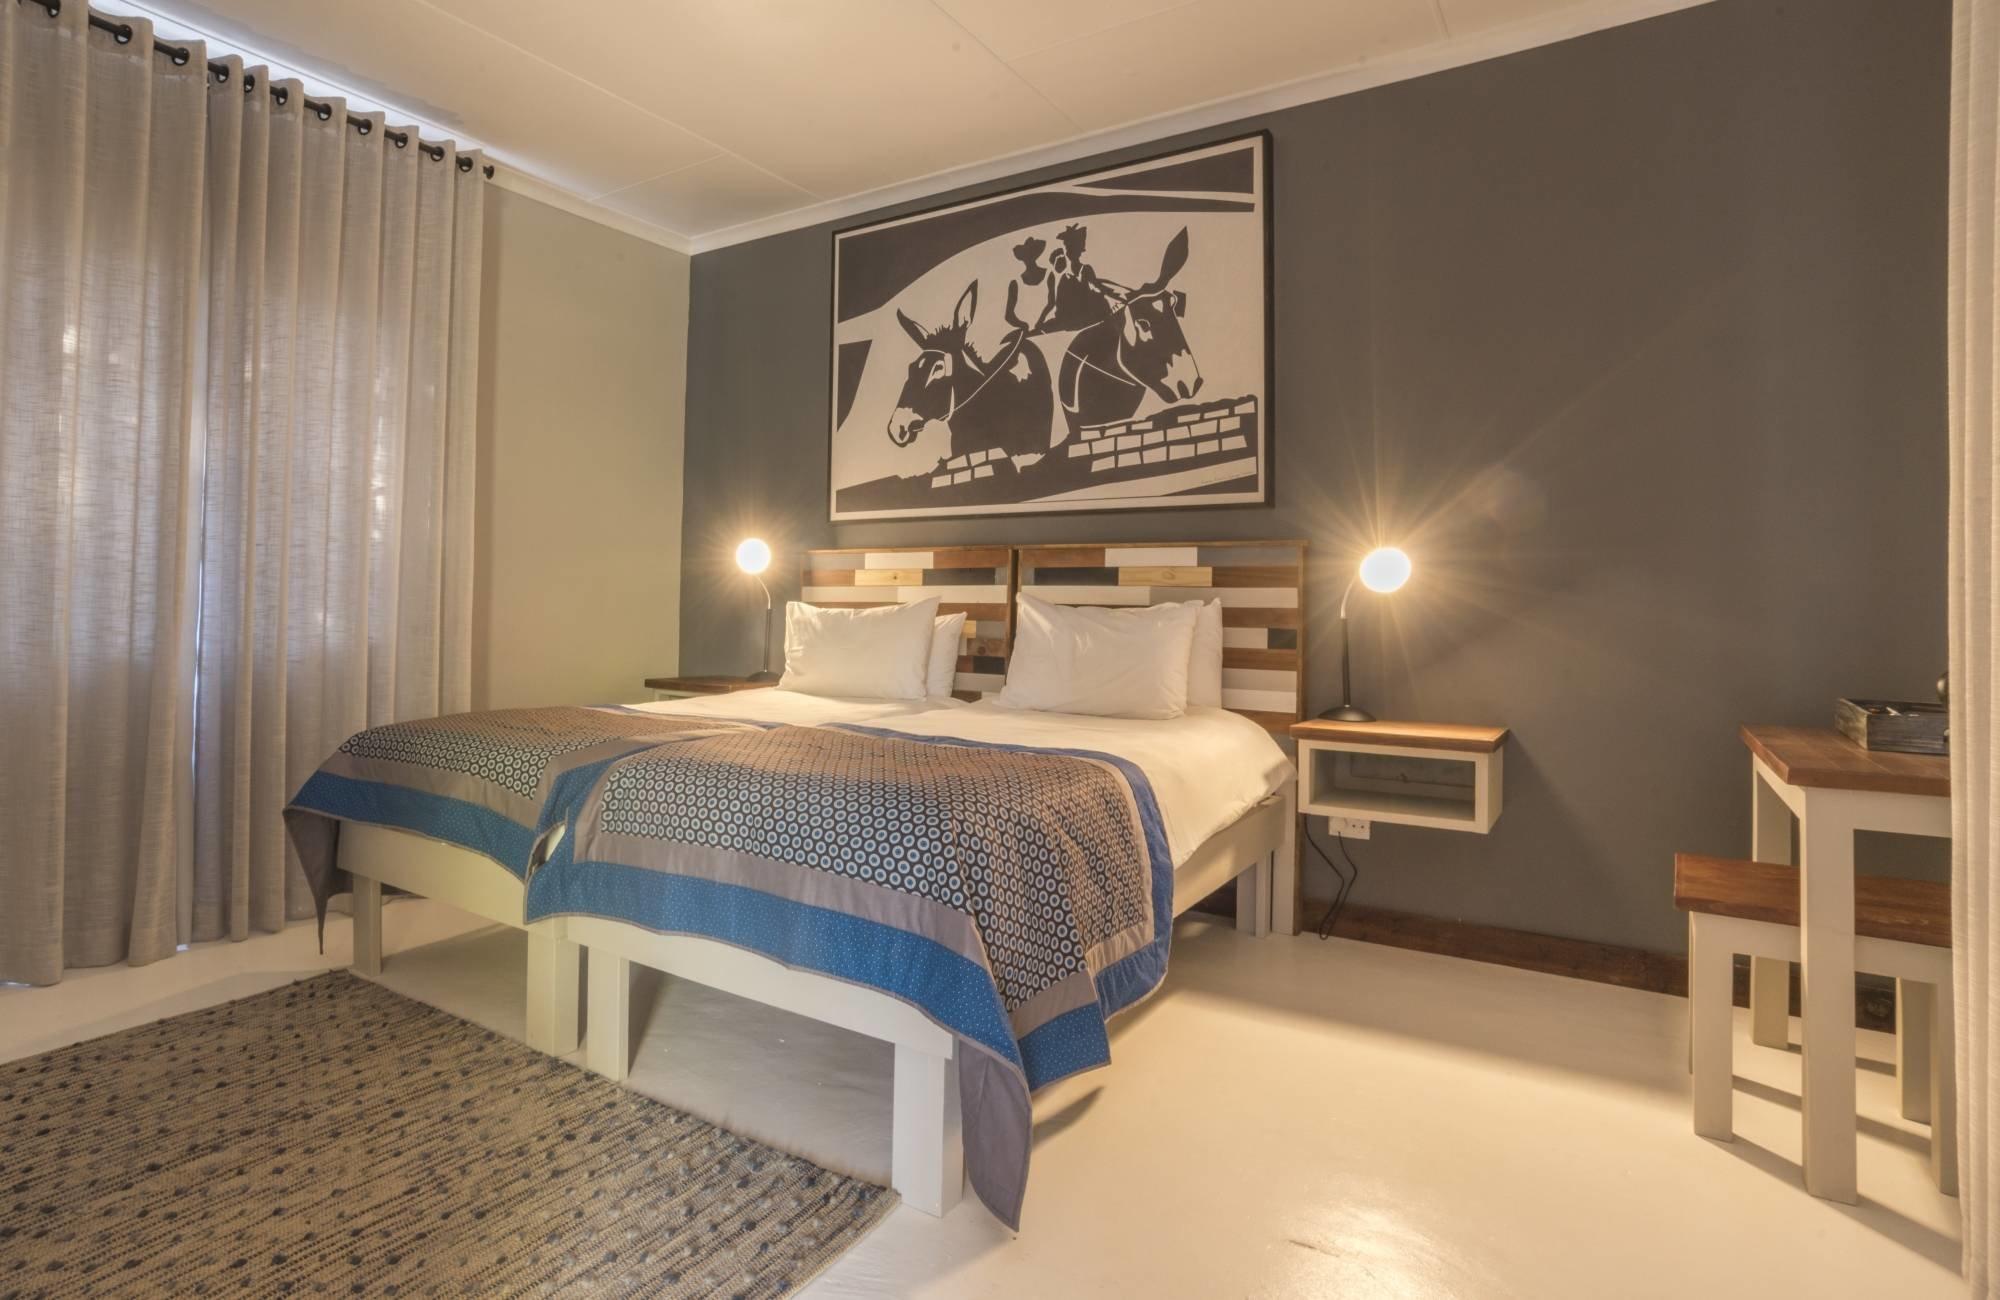 Room interior, Damaraland